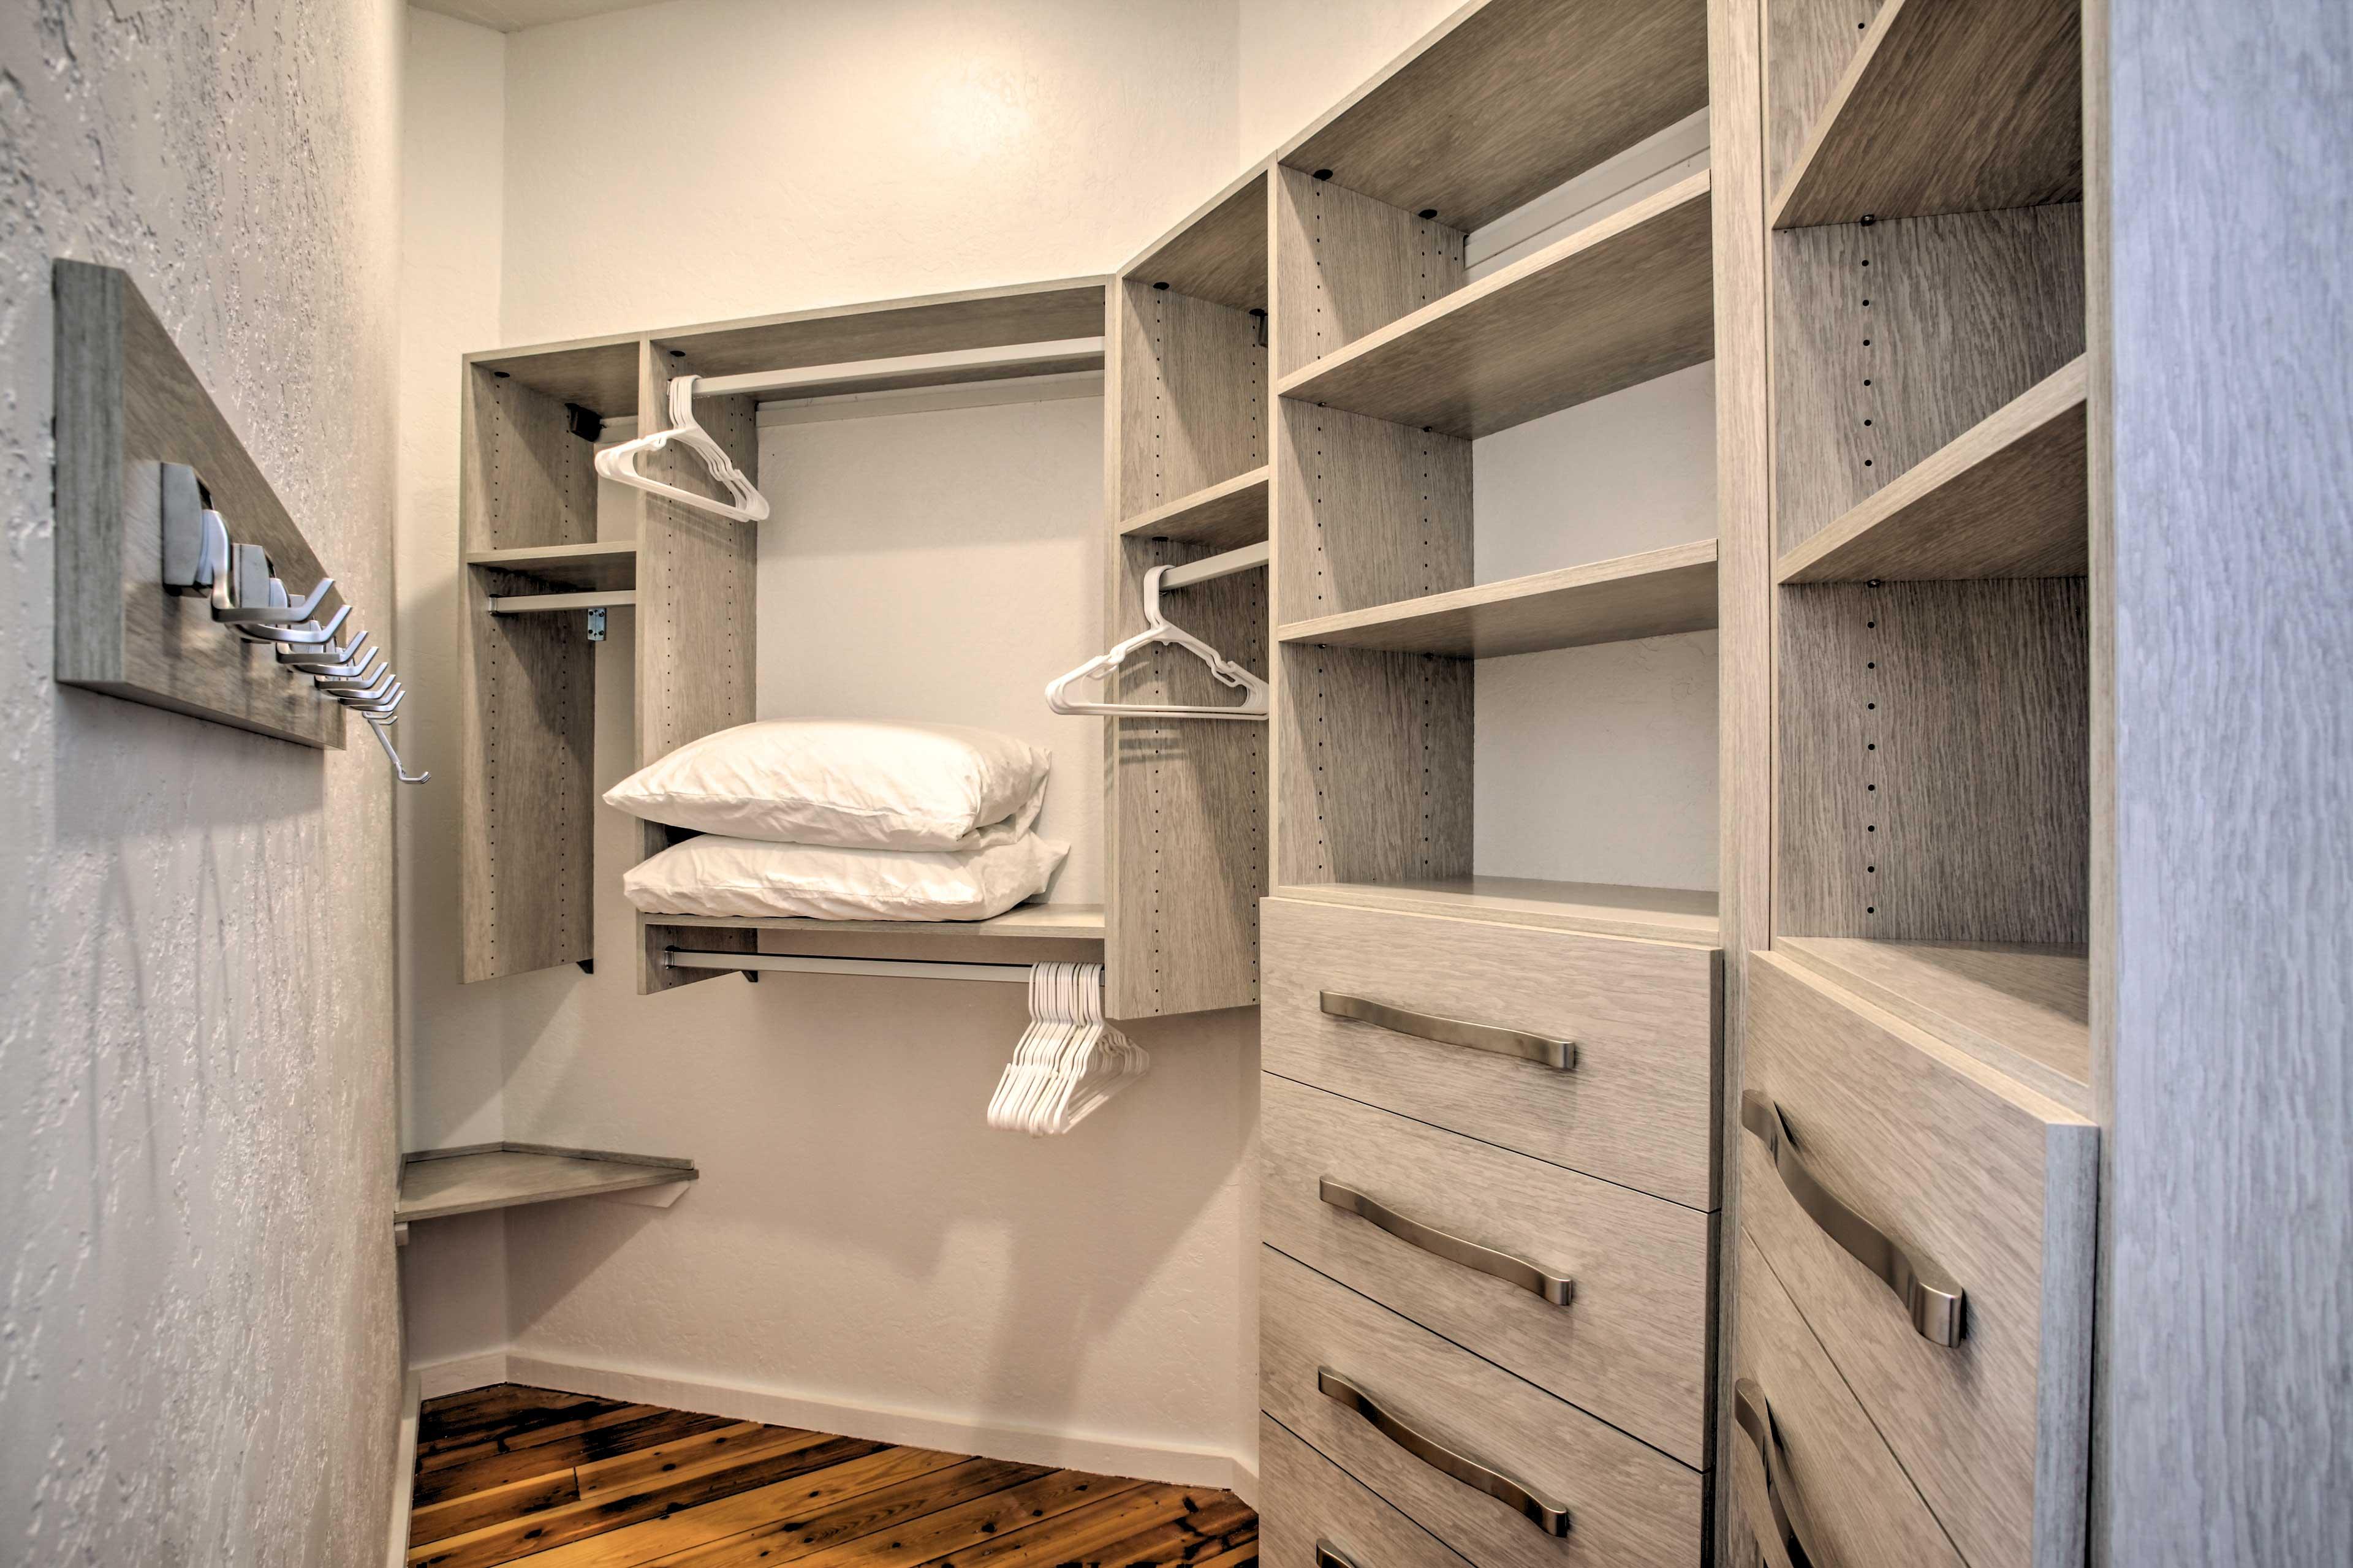 Organize your travel wardrobe in the walk-in closet!